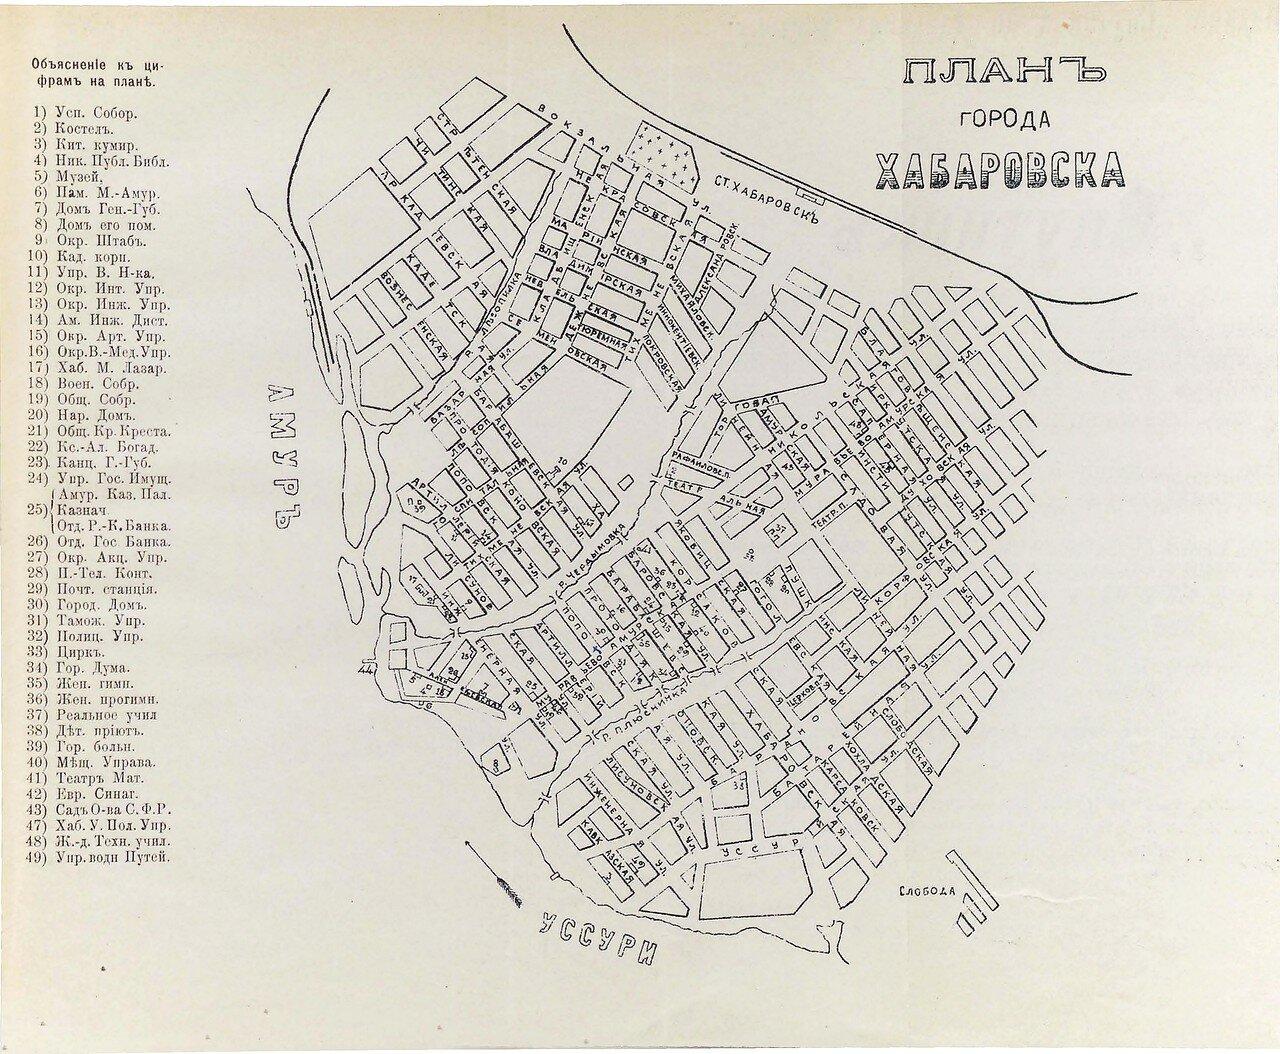 03. План города Хабаровска